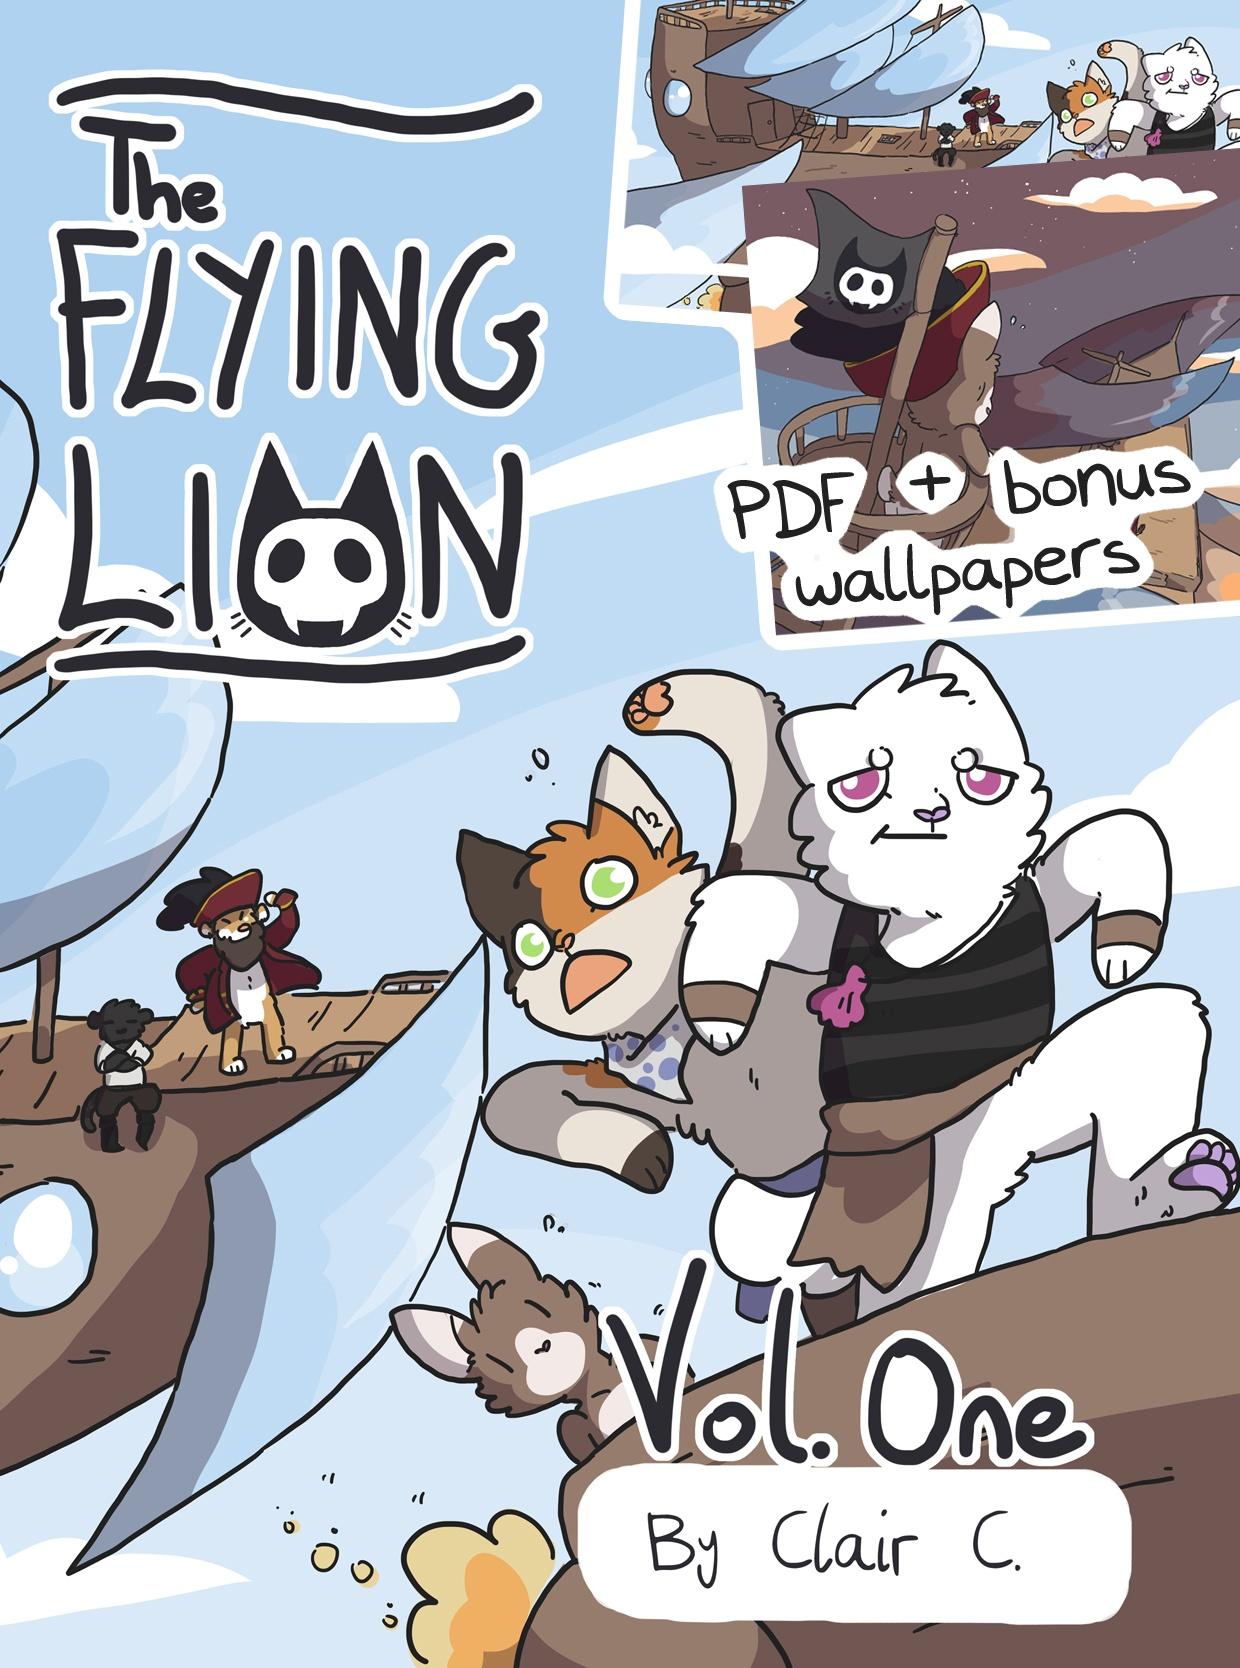 The Flying Lion Vol.1 PDF & Wallpaper Bundle